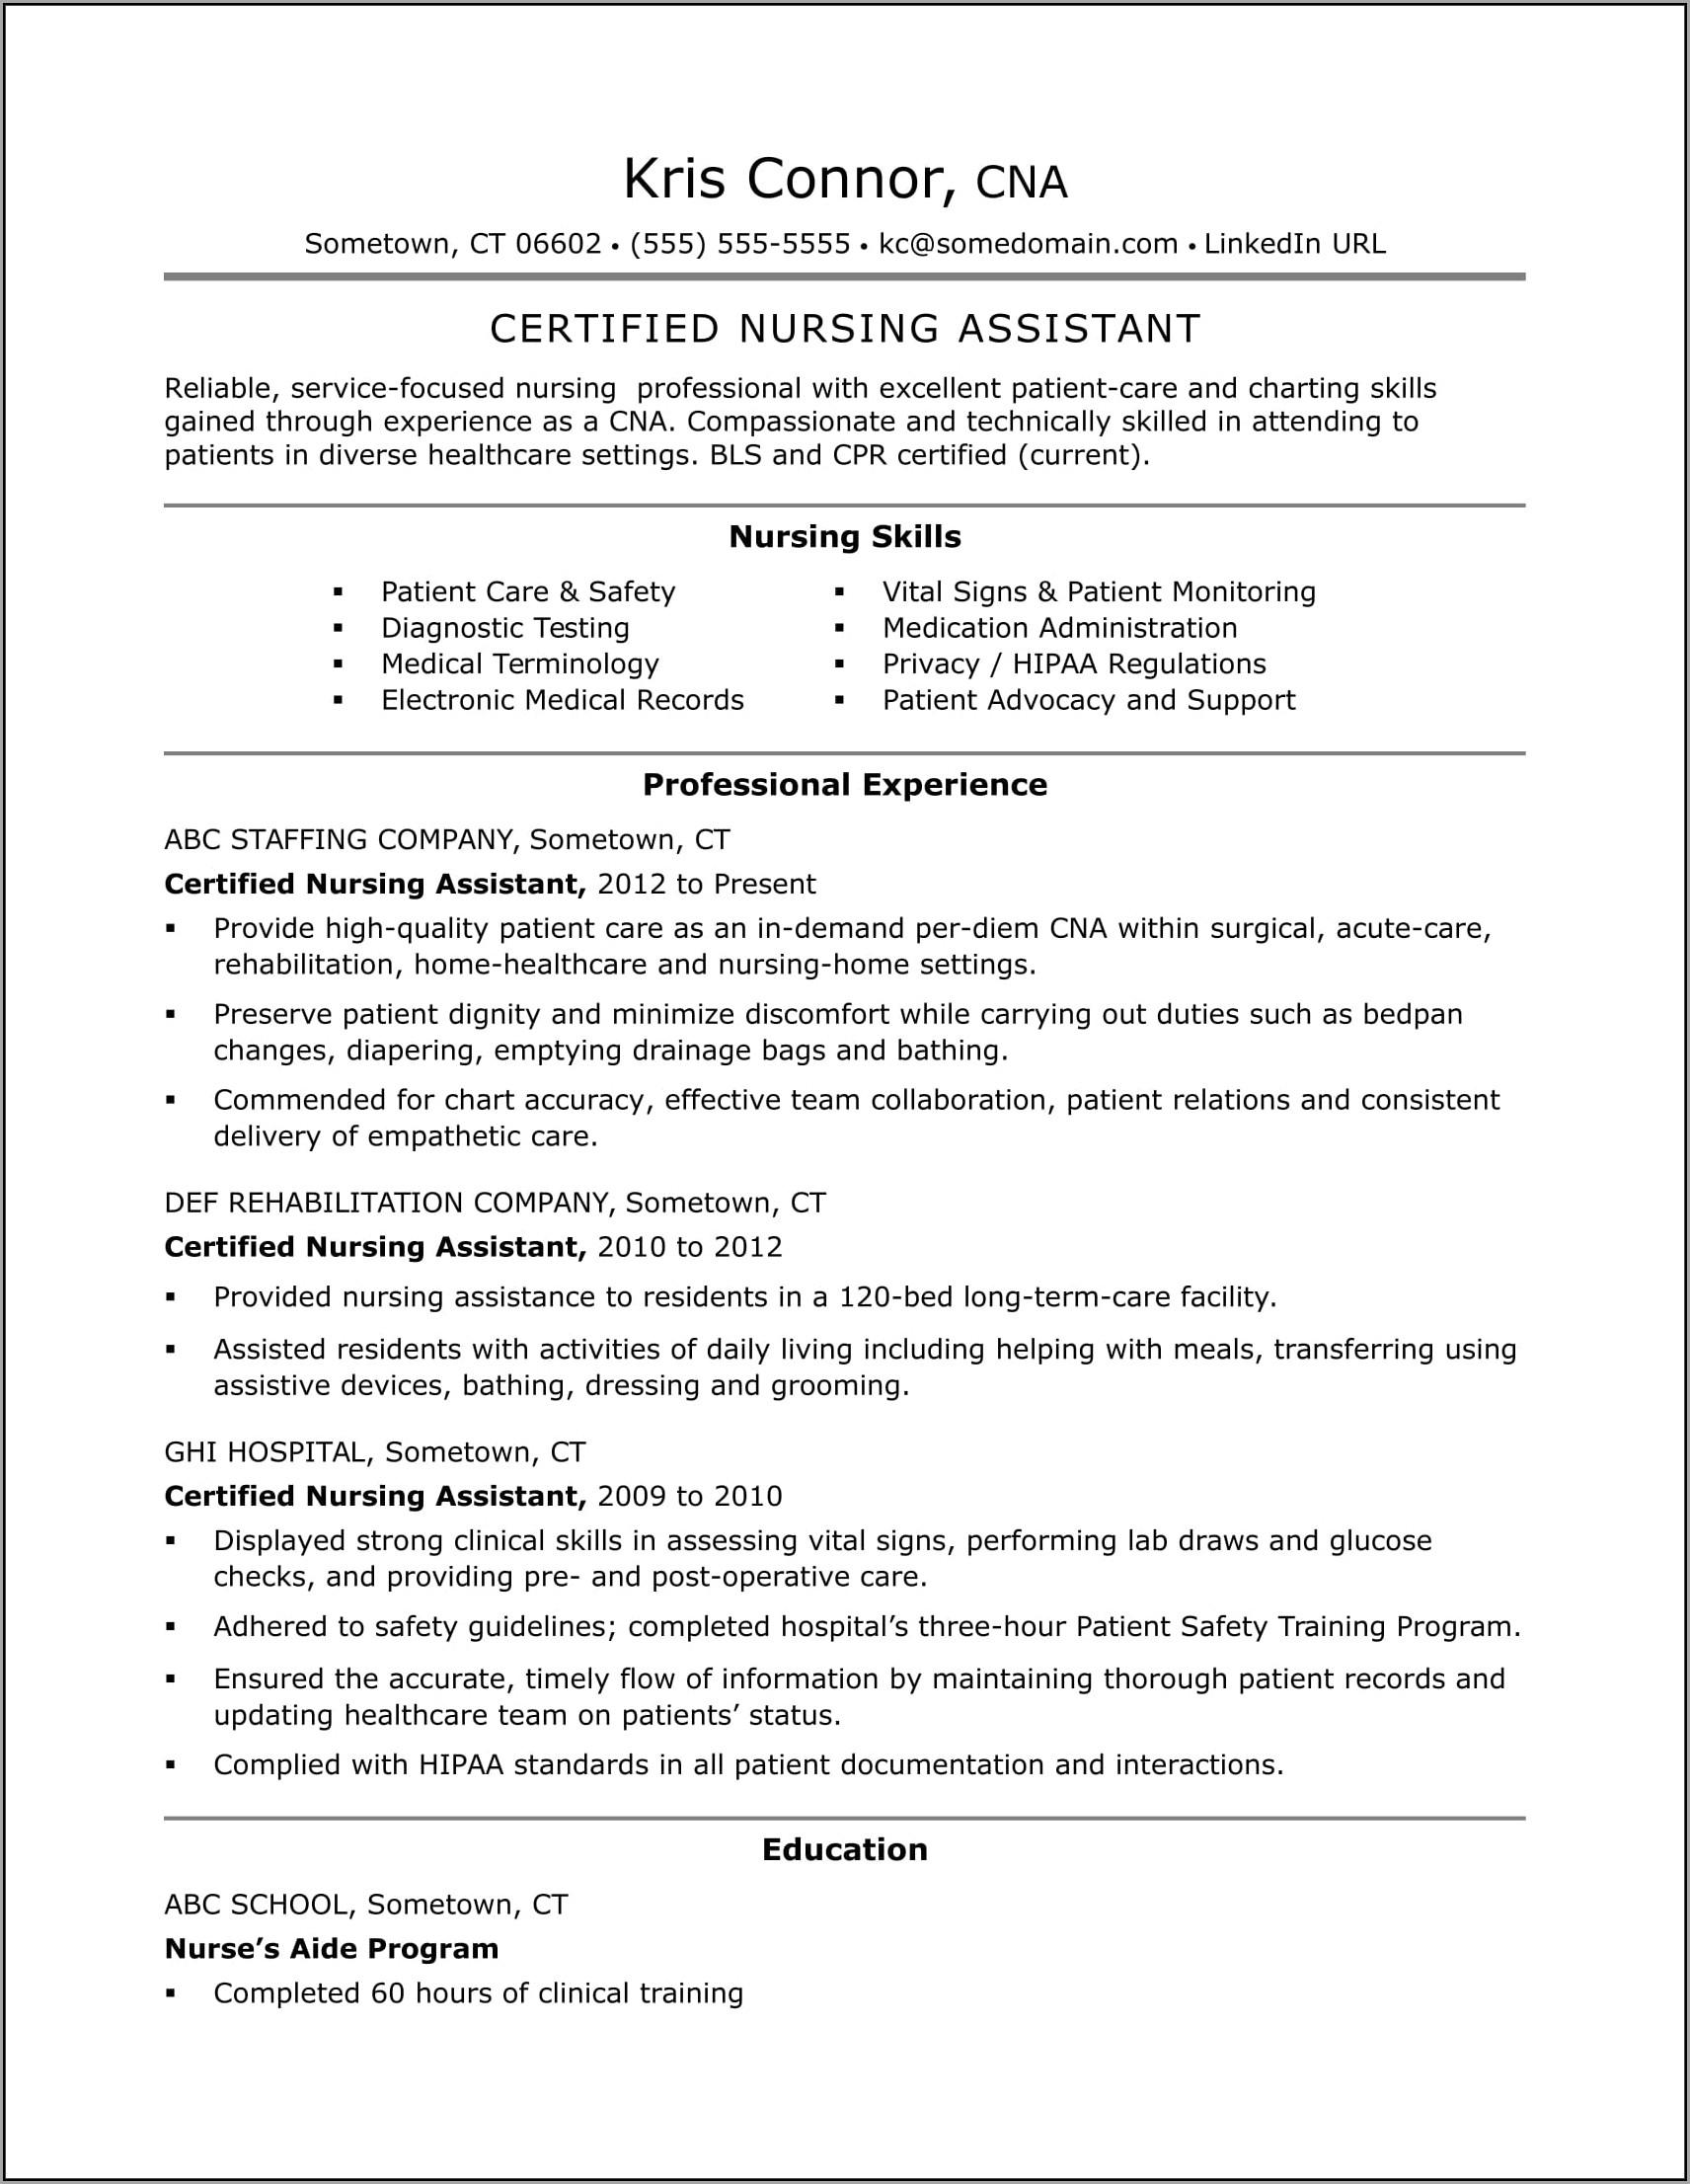 Free Printable Cna Resume